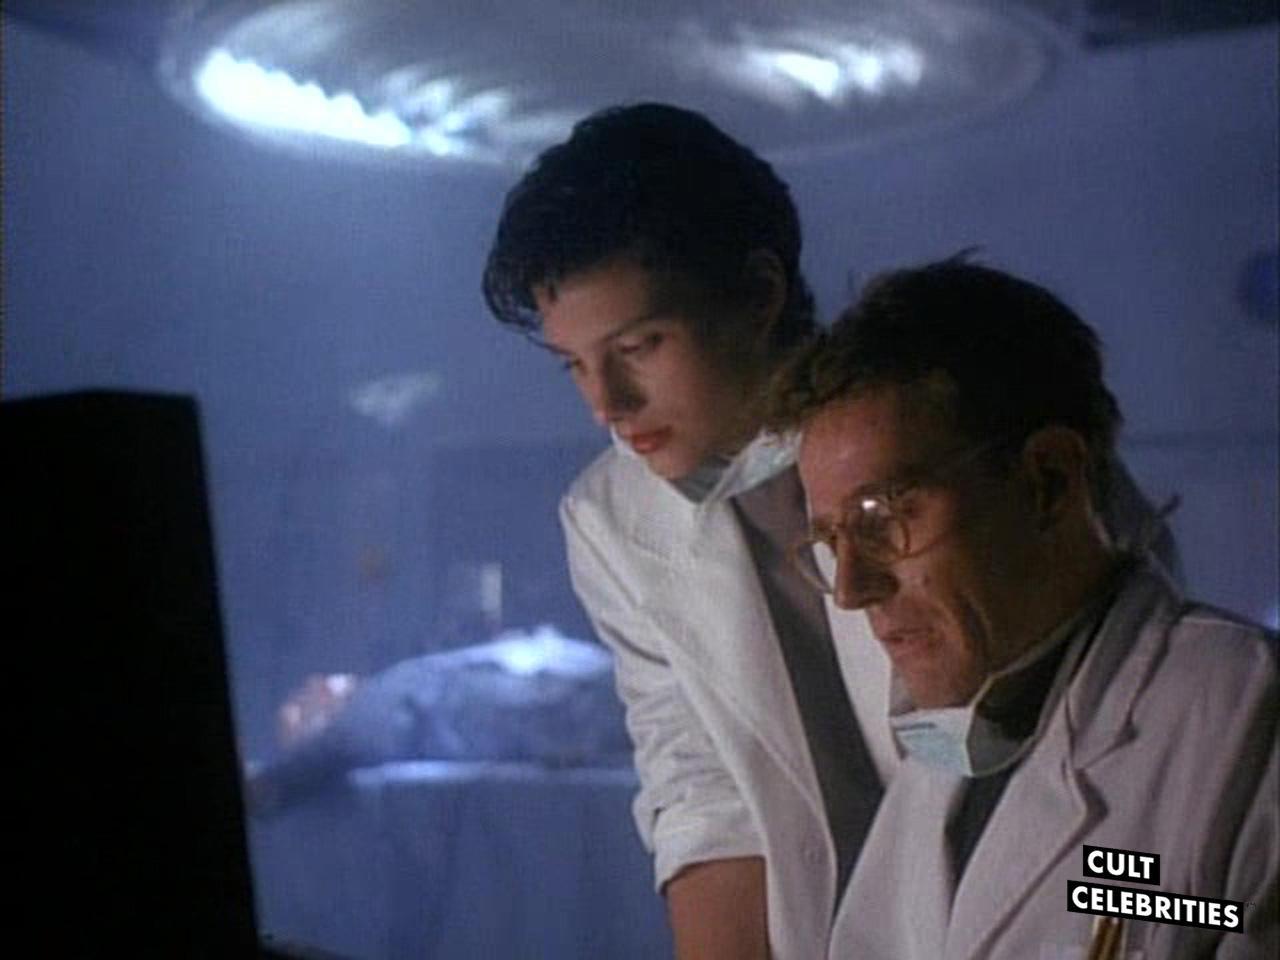 Bryan Cranston in Dead Space (1991)